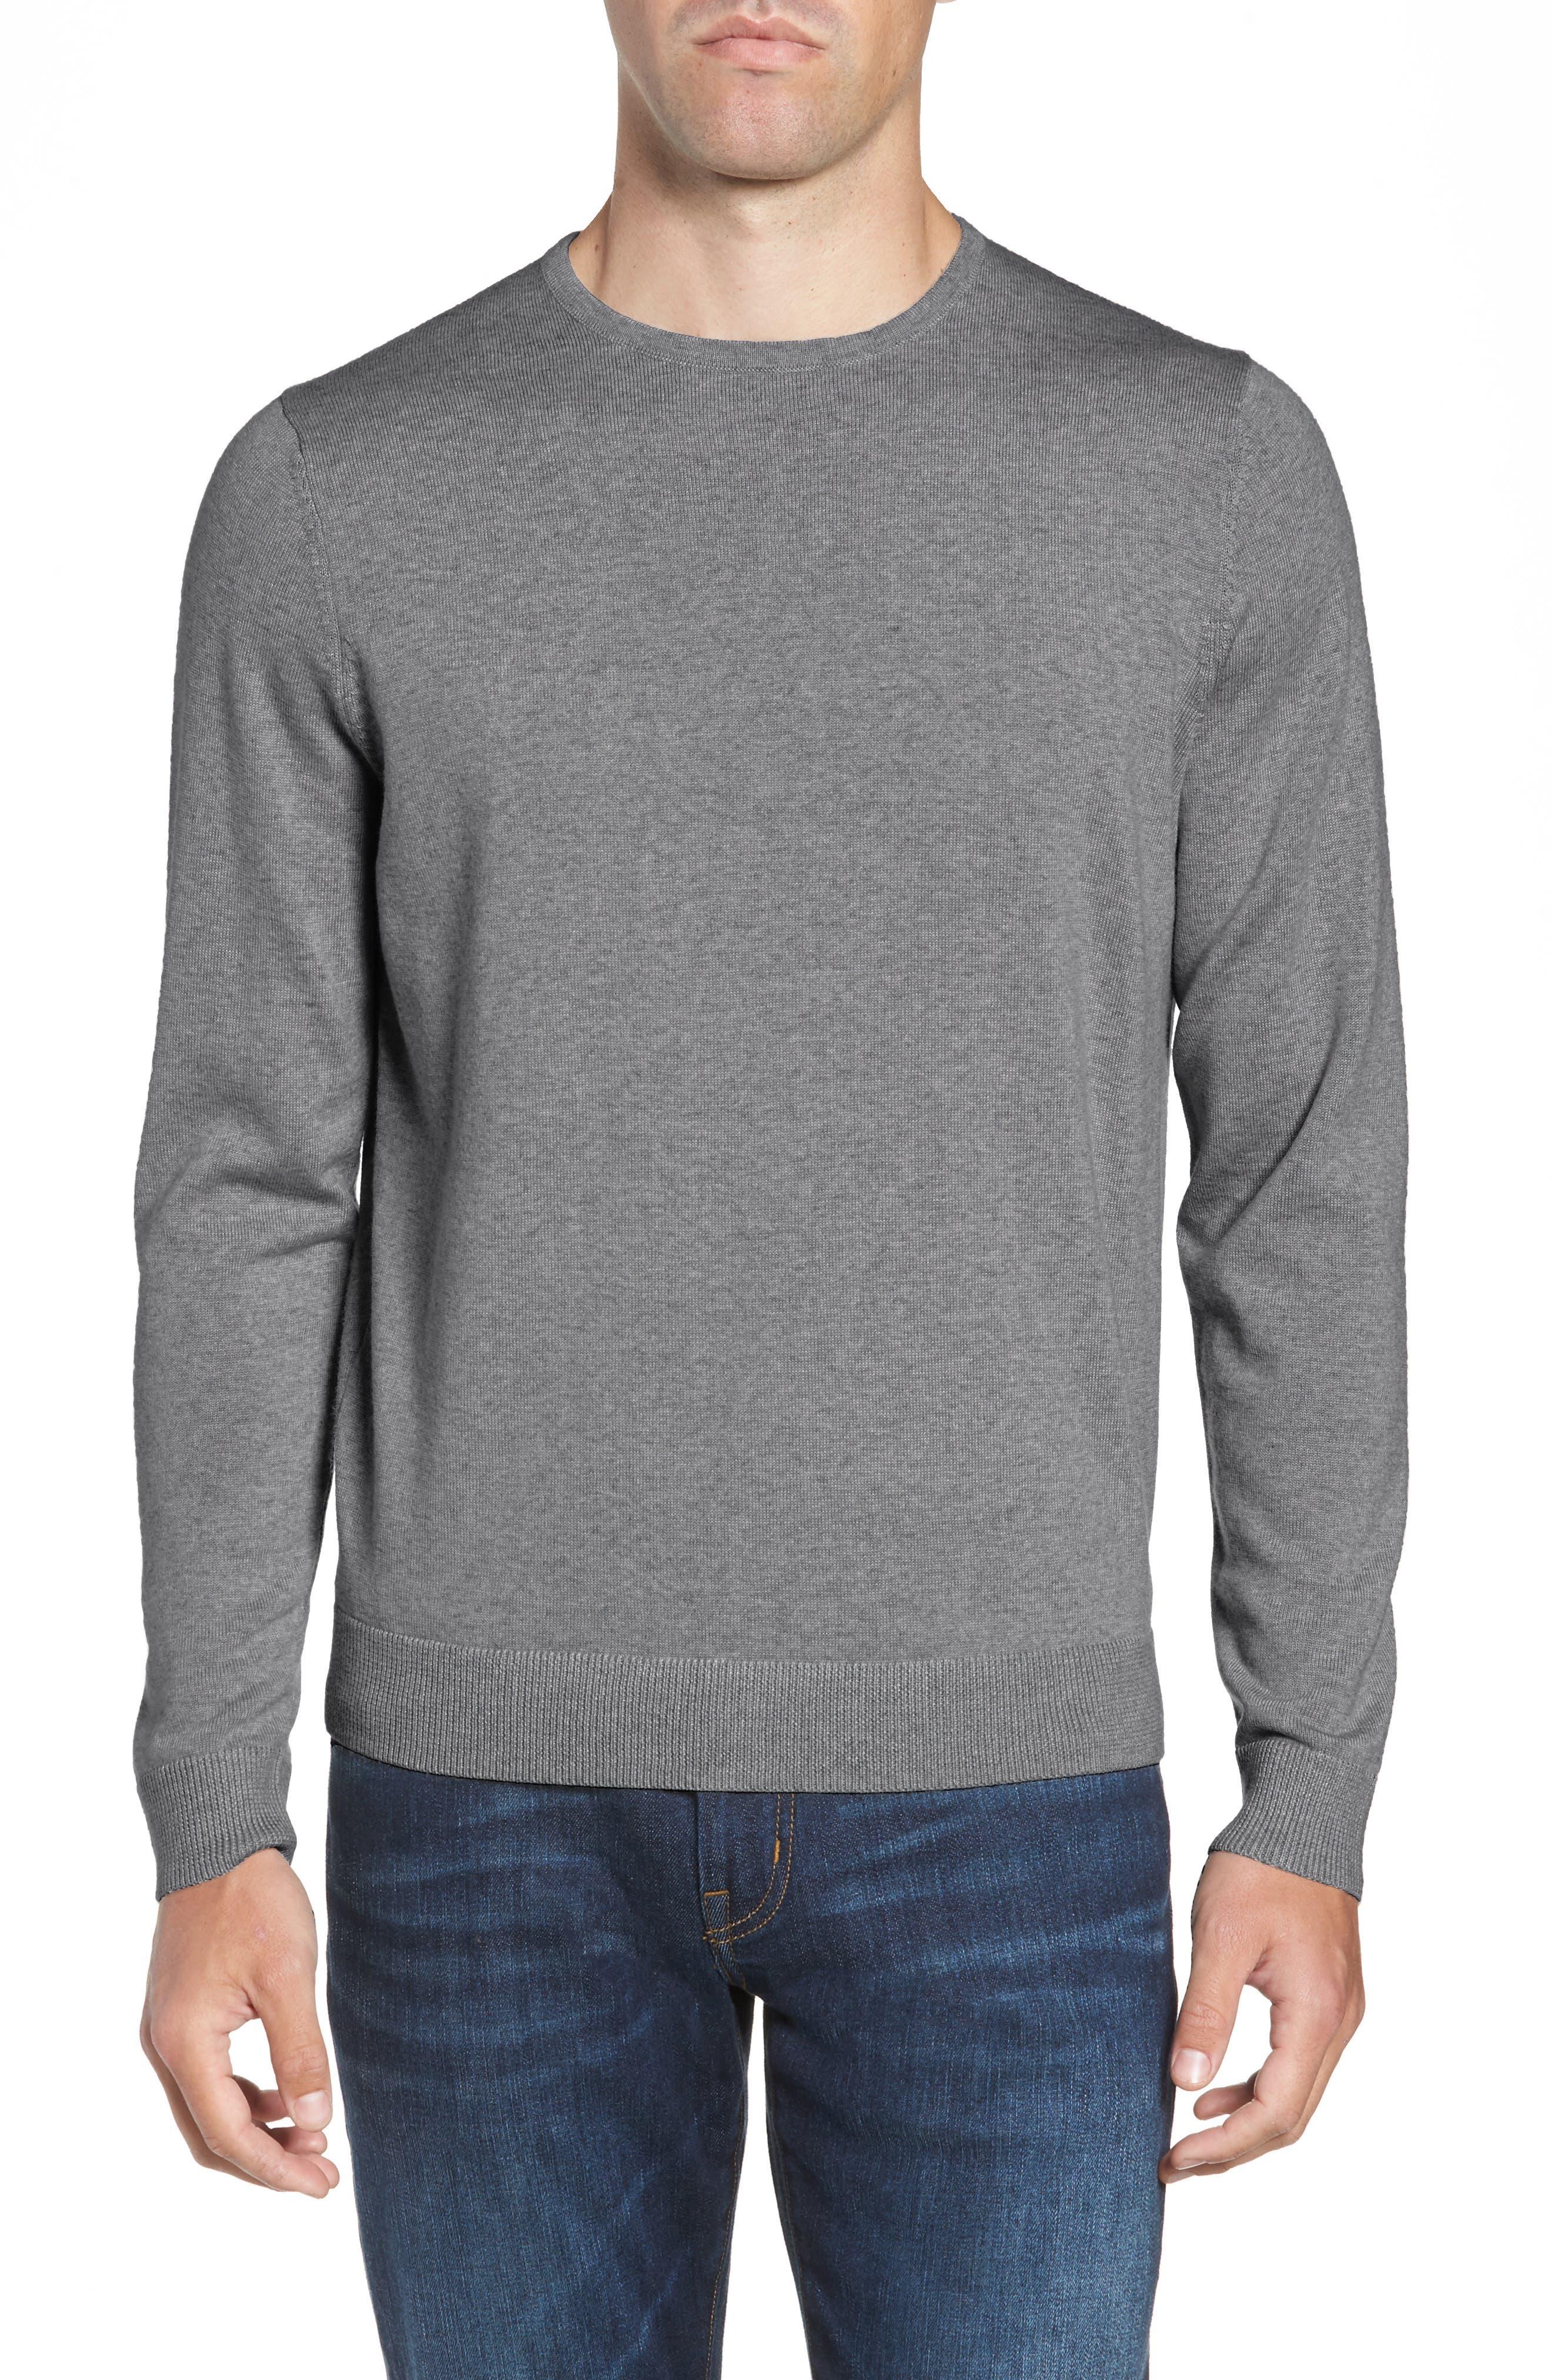 Nordstrom Shop Crewneck Merino Wool Sweater, Grey